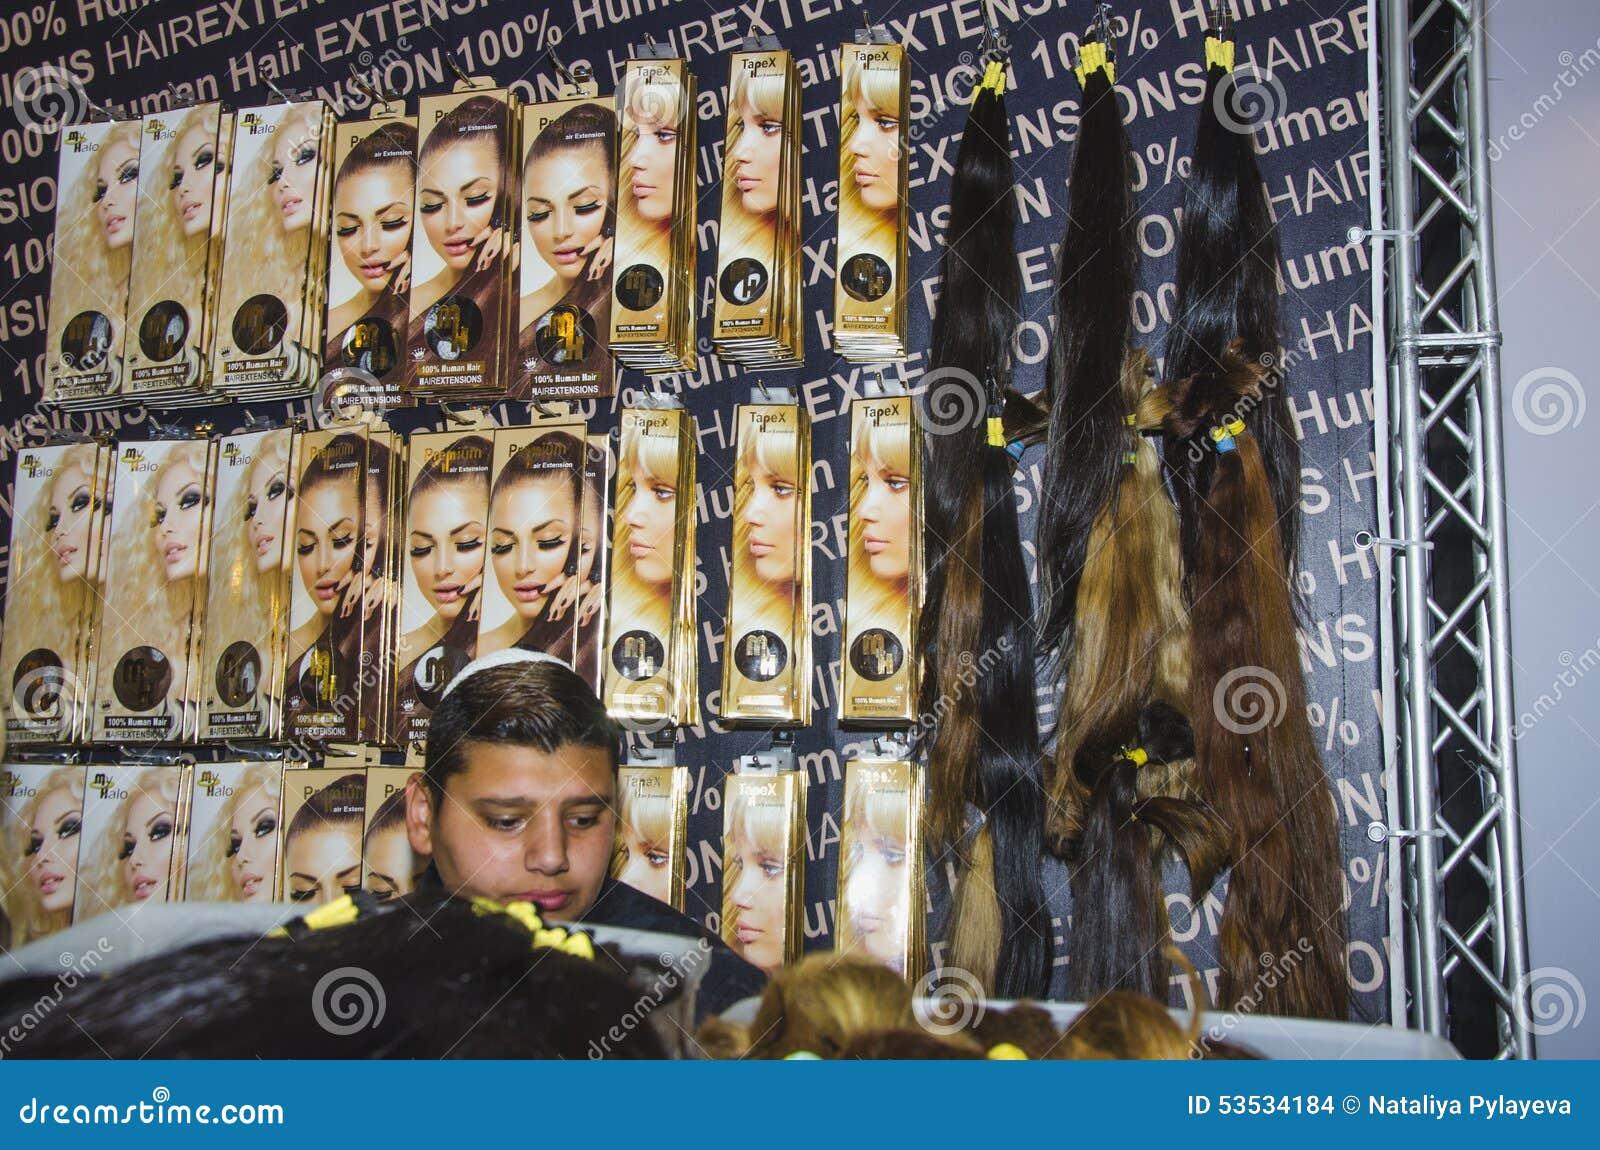 27 de abril - telefone Aviv ISRAEL - perucas do vendedor - beleza de OMC Cosmo, 2015